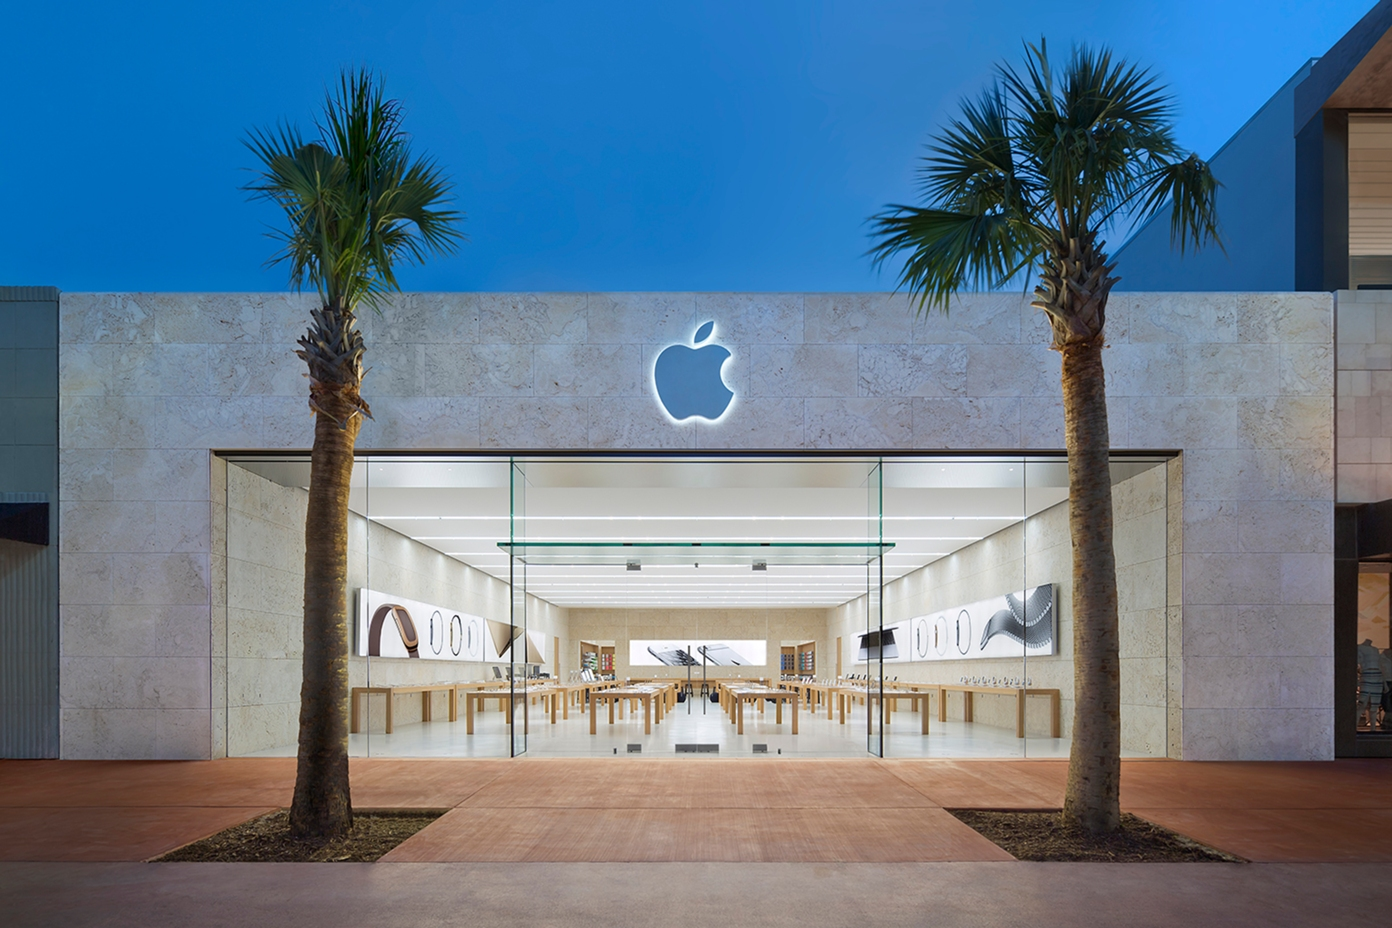 Apple Lincoln Road, en Miami Beach, Florida